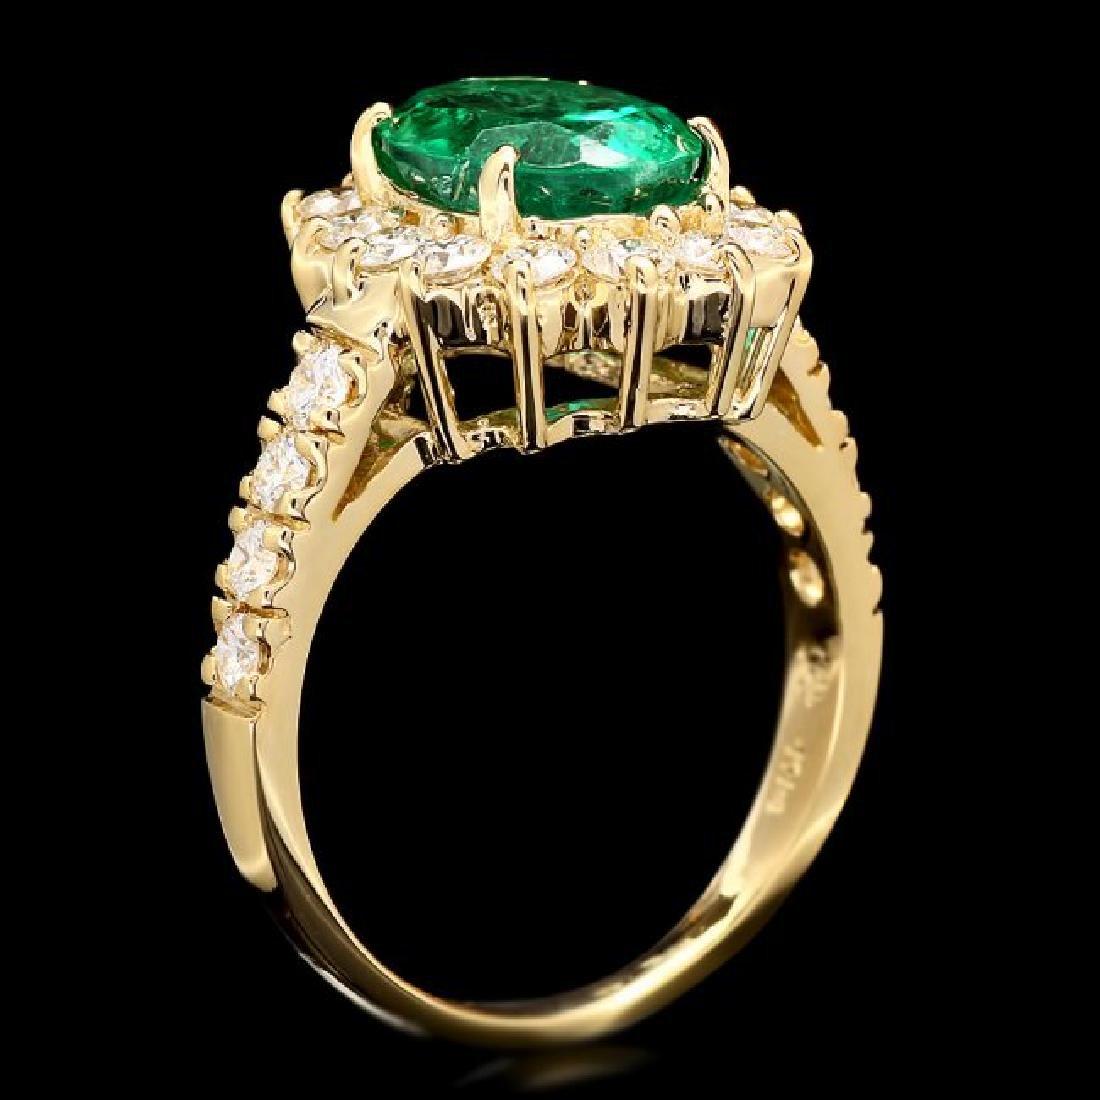 14k Gold 2.65ct Emerald 1.10ct Diamond Ring - 3